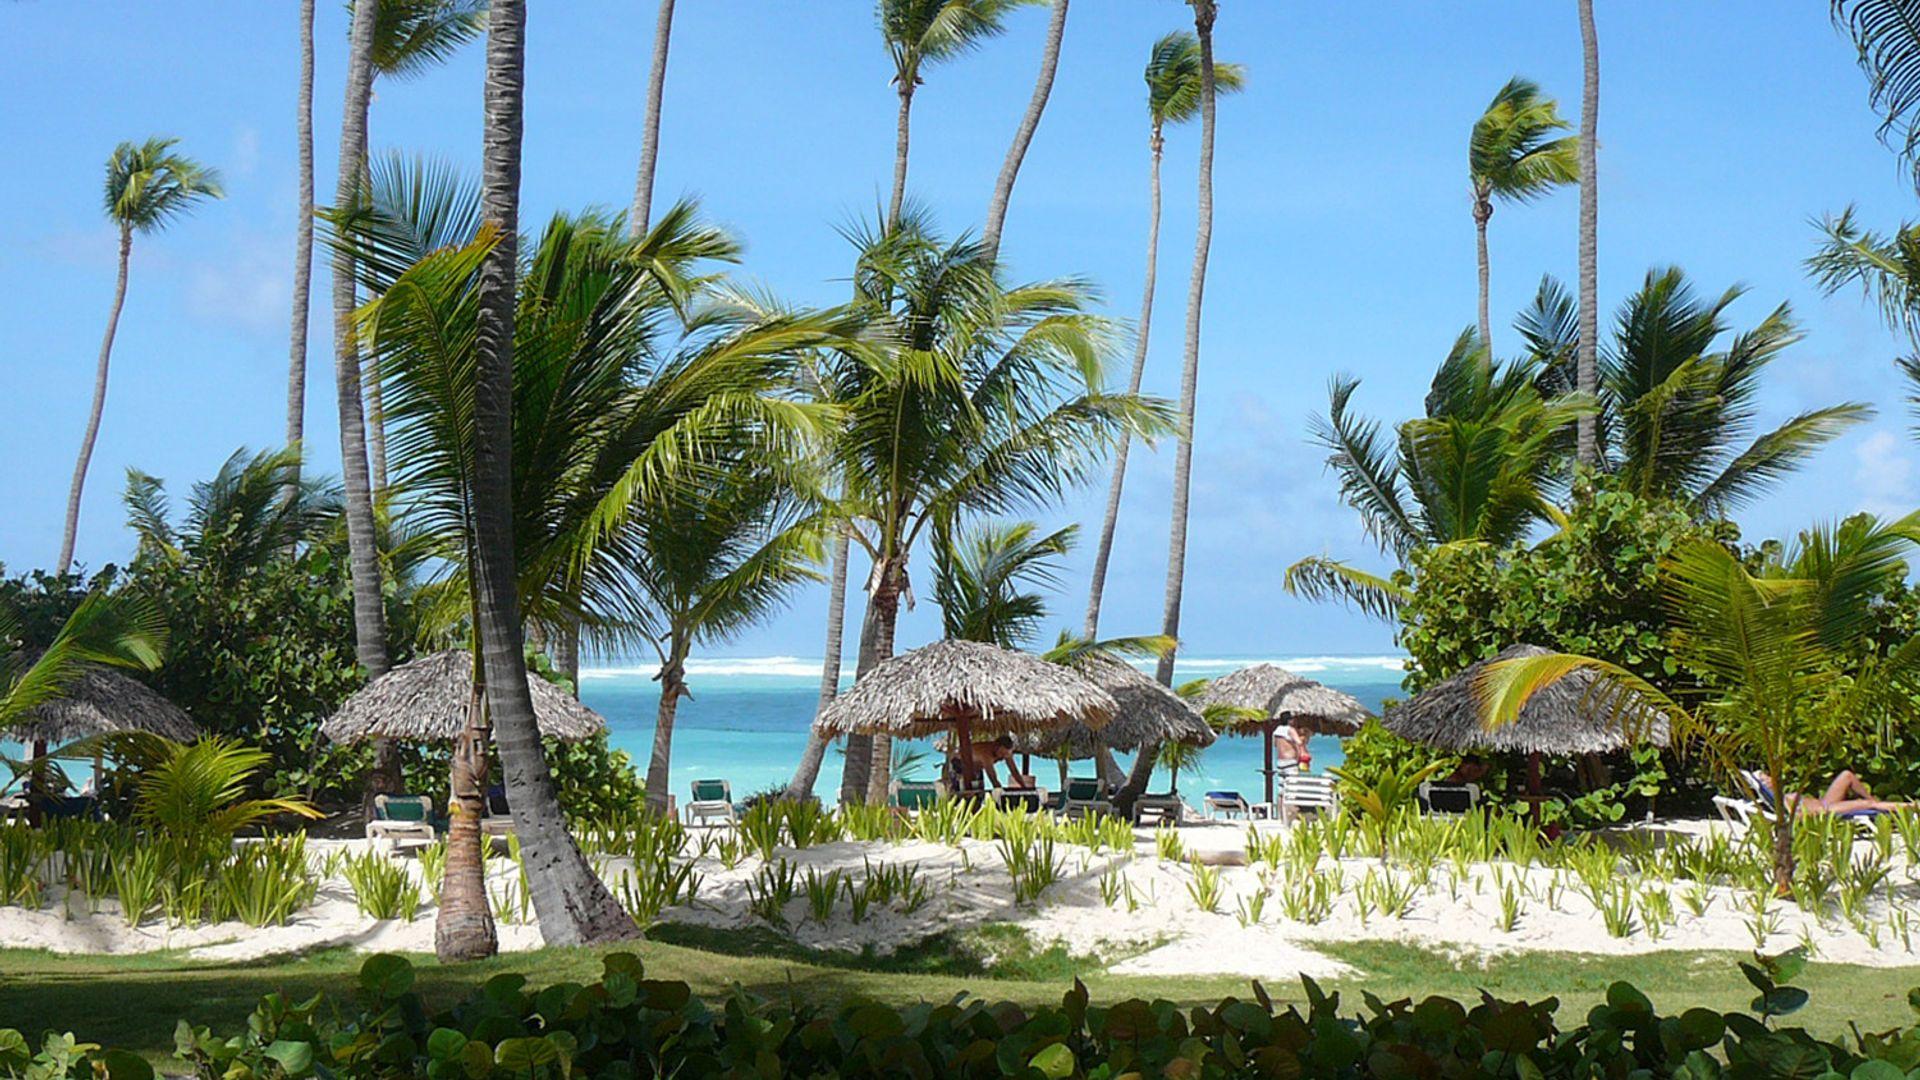 Best Deal TravelHubX - Sejur plaja Republica Dominicana, 9 zile - 29 octombrie 2021